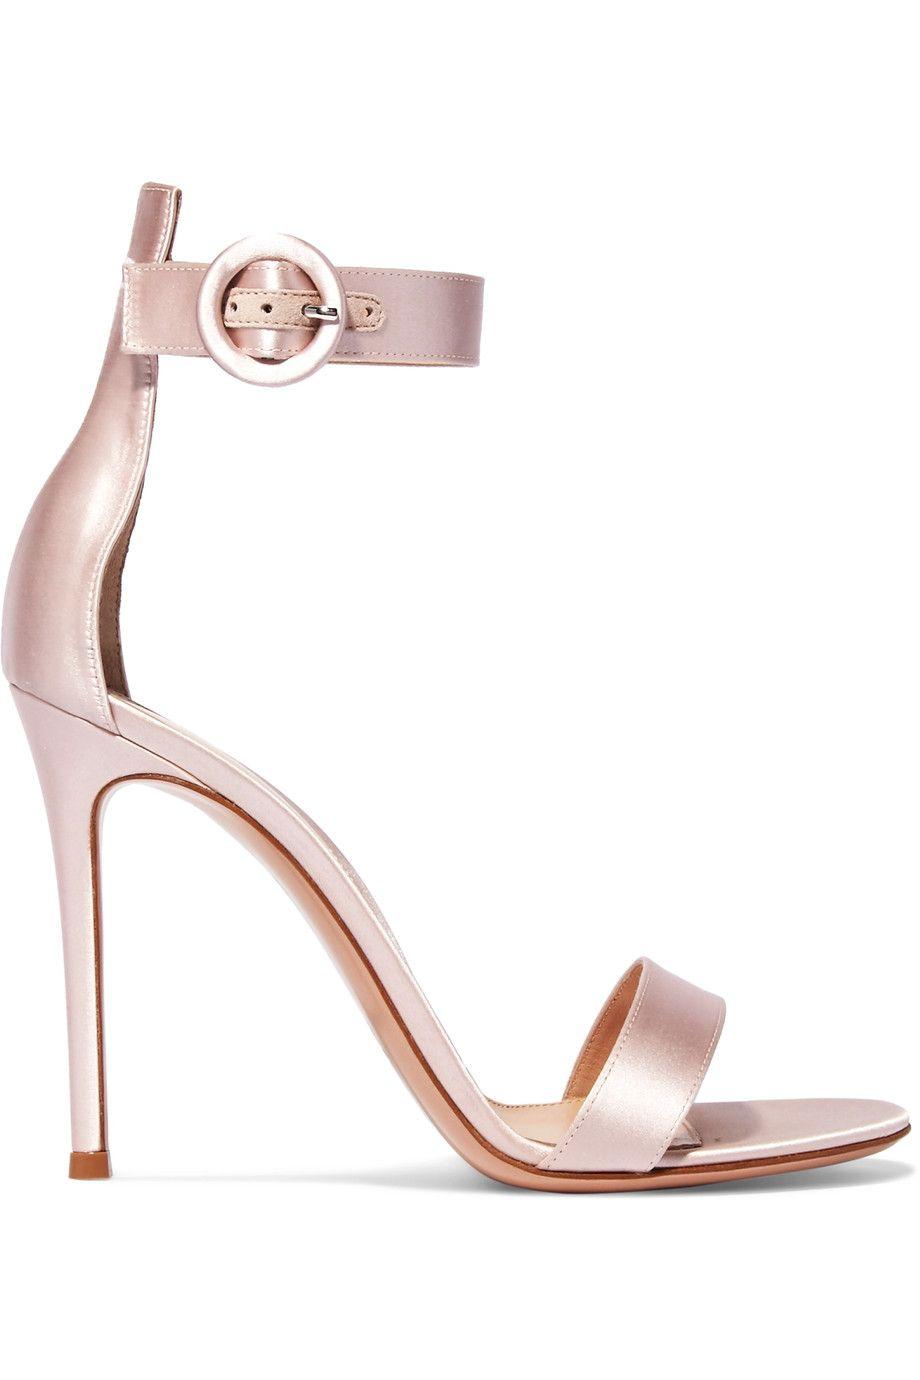 PAUL ANDREW Flora Metallic Leather Sandals Gr. IT 37.5